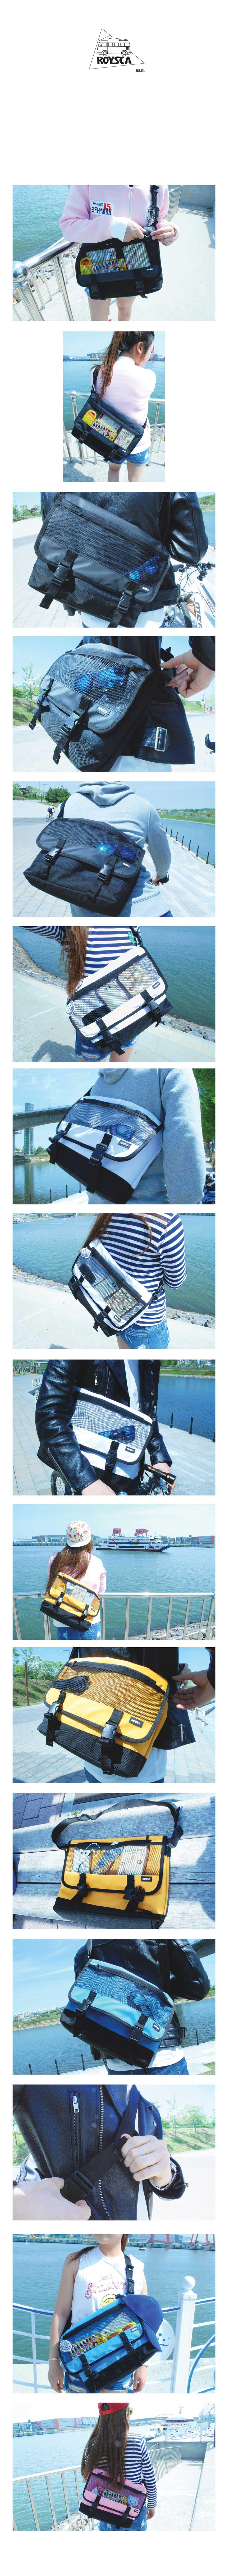 MASH MESSENGER BAG-BABY PINK - 로이스카, 78,000원, 크로스백, 패브릭크로스백